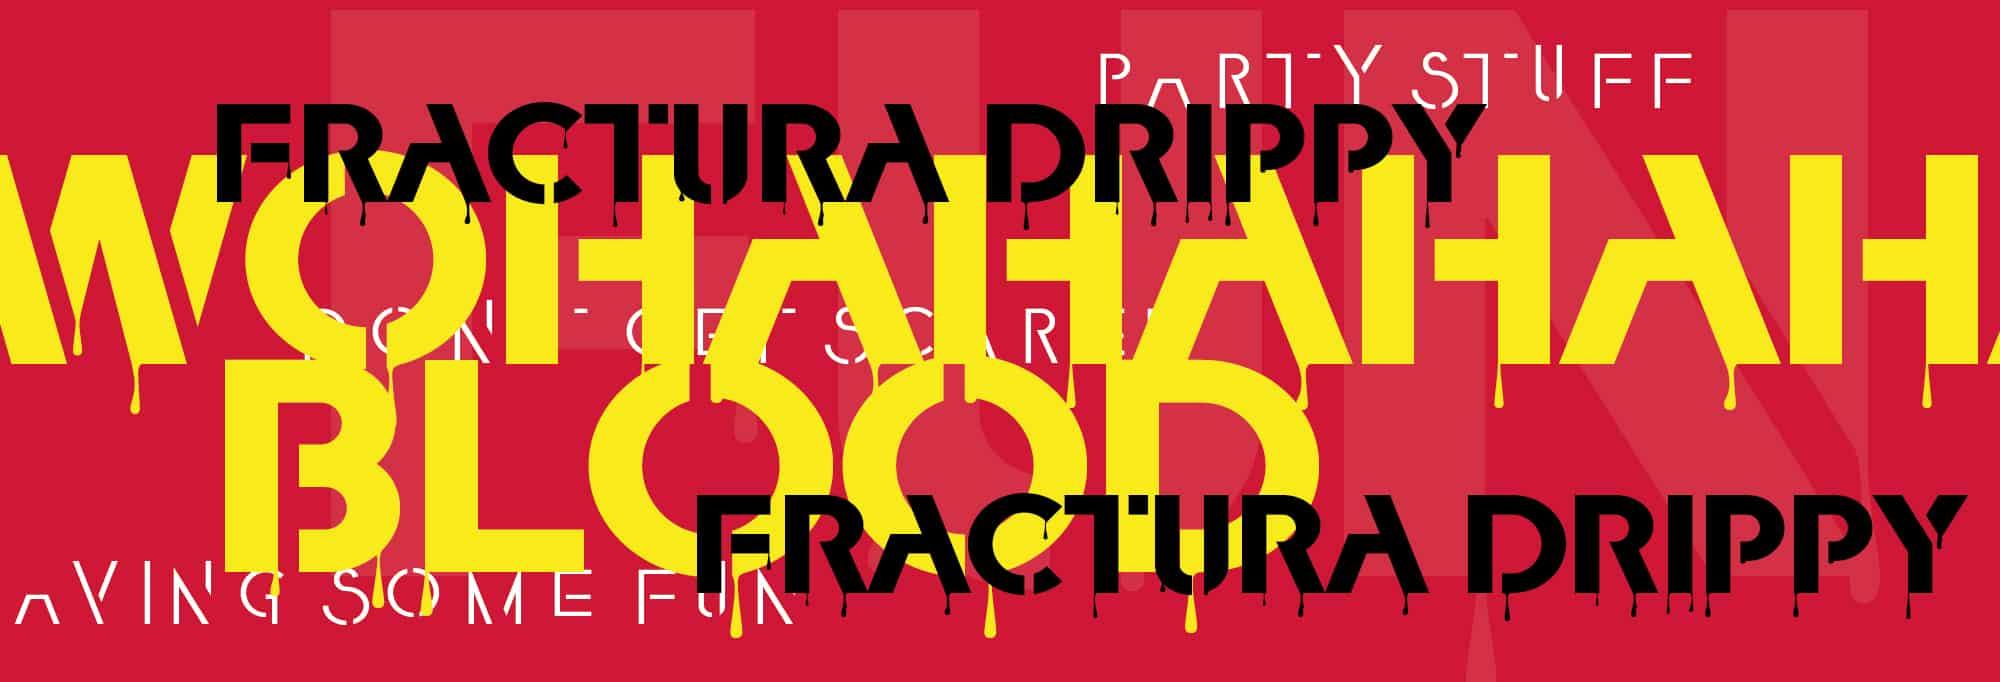 CTV_Fractura-ND_bauertypes_08